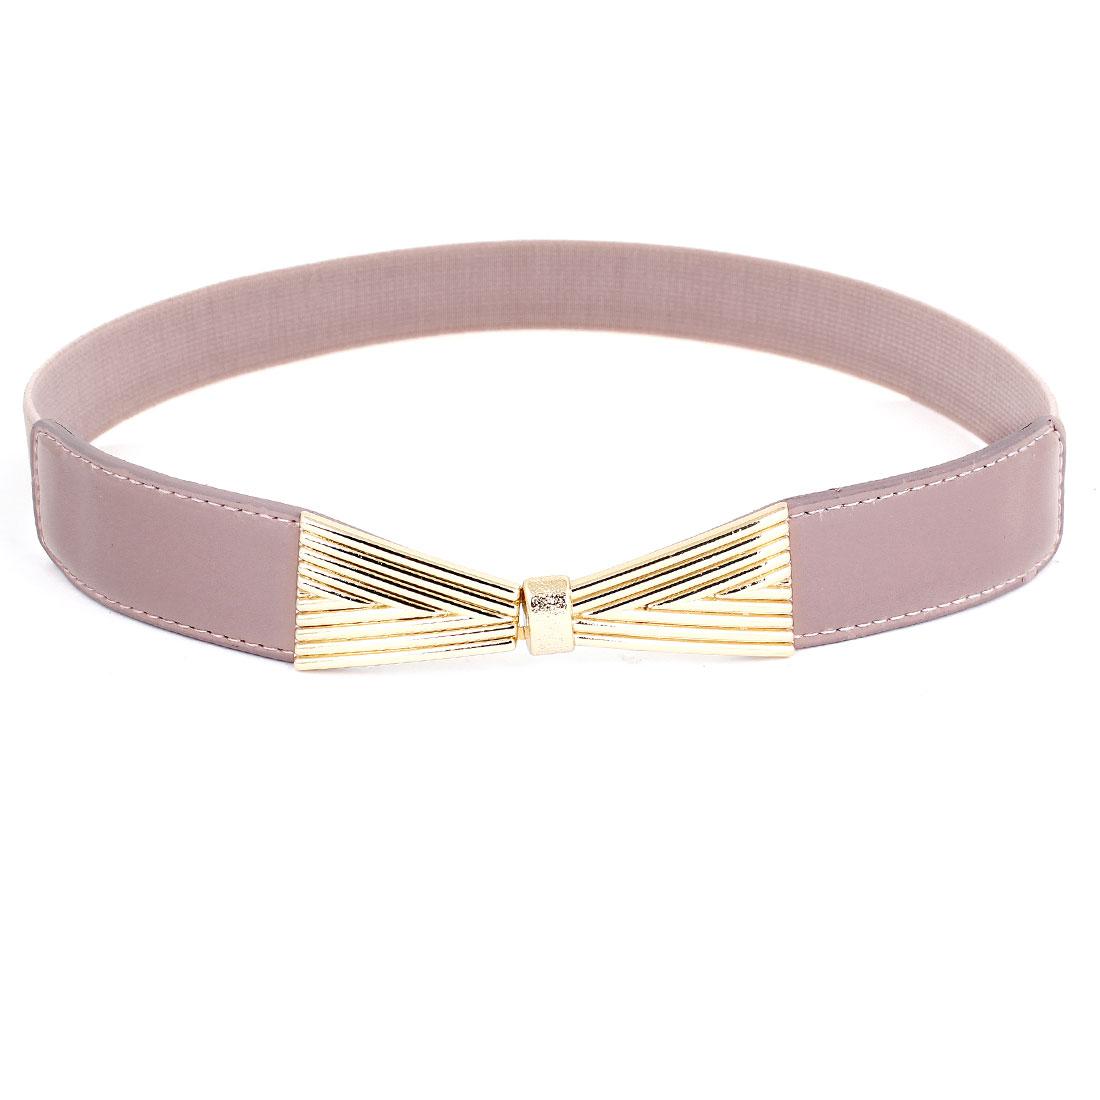 "Lady Interlocking Hook Buckle 1"" Width Elastic Waist Band Belt Pale Pink"